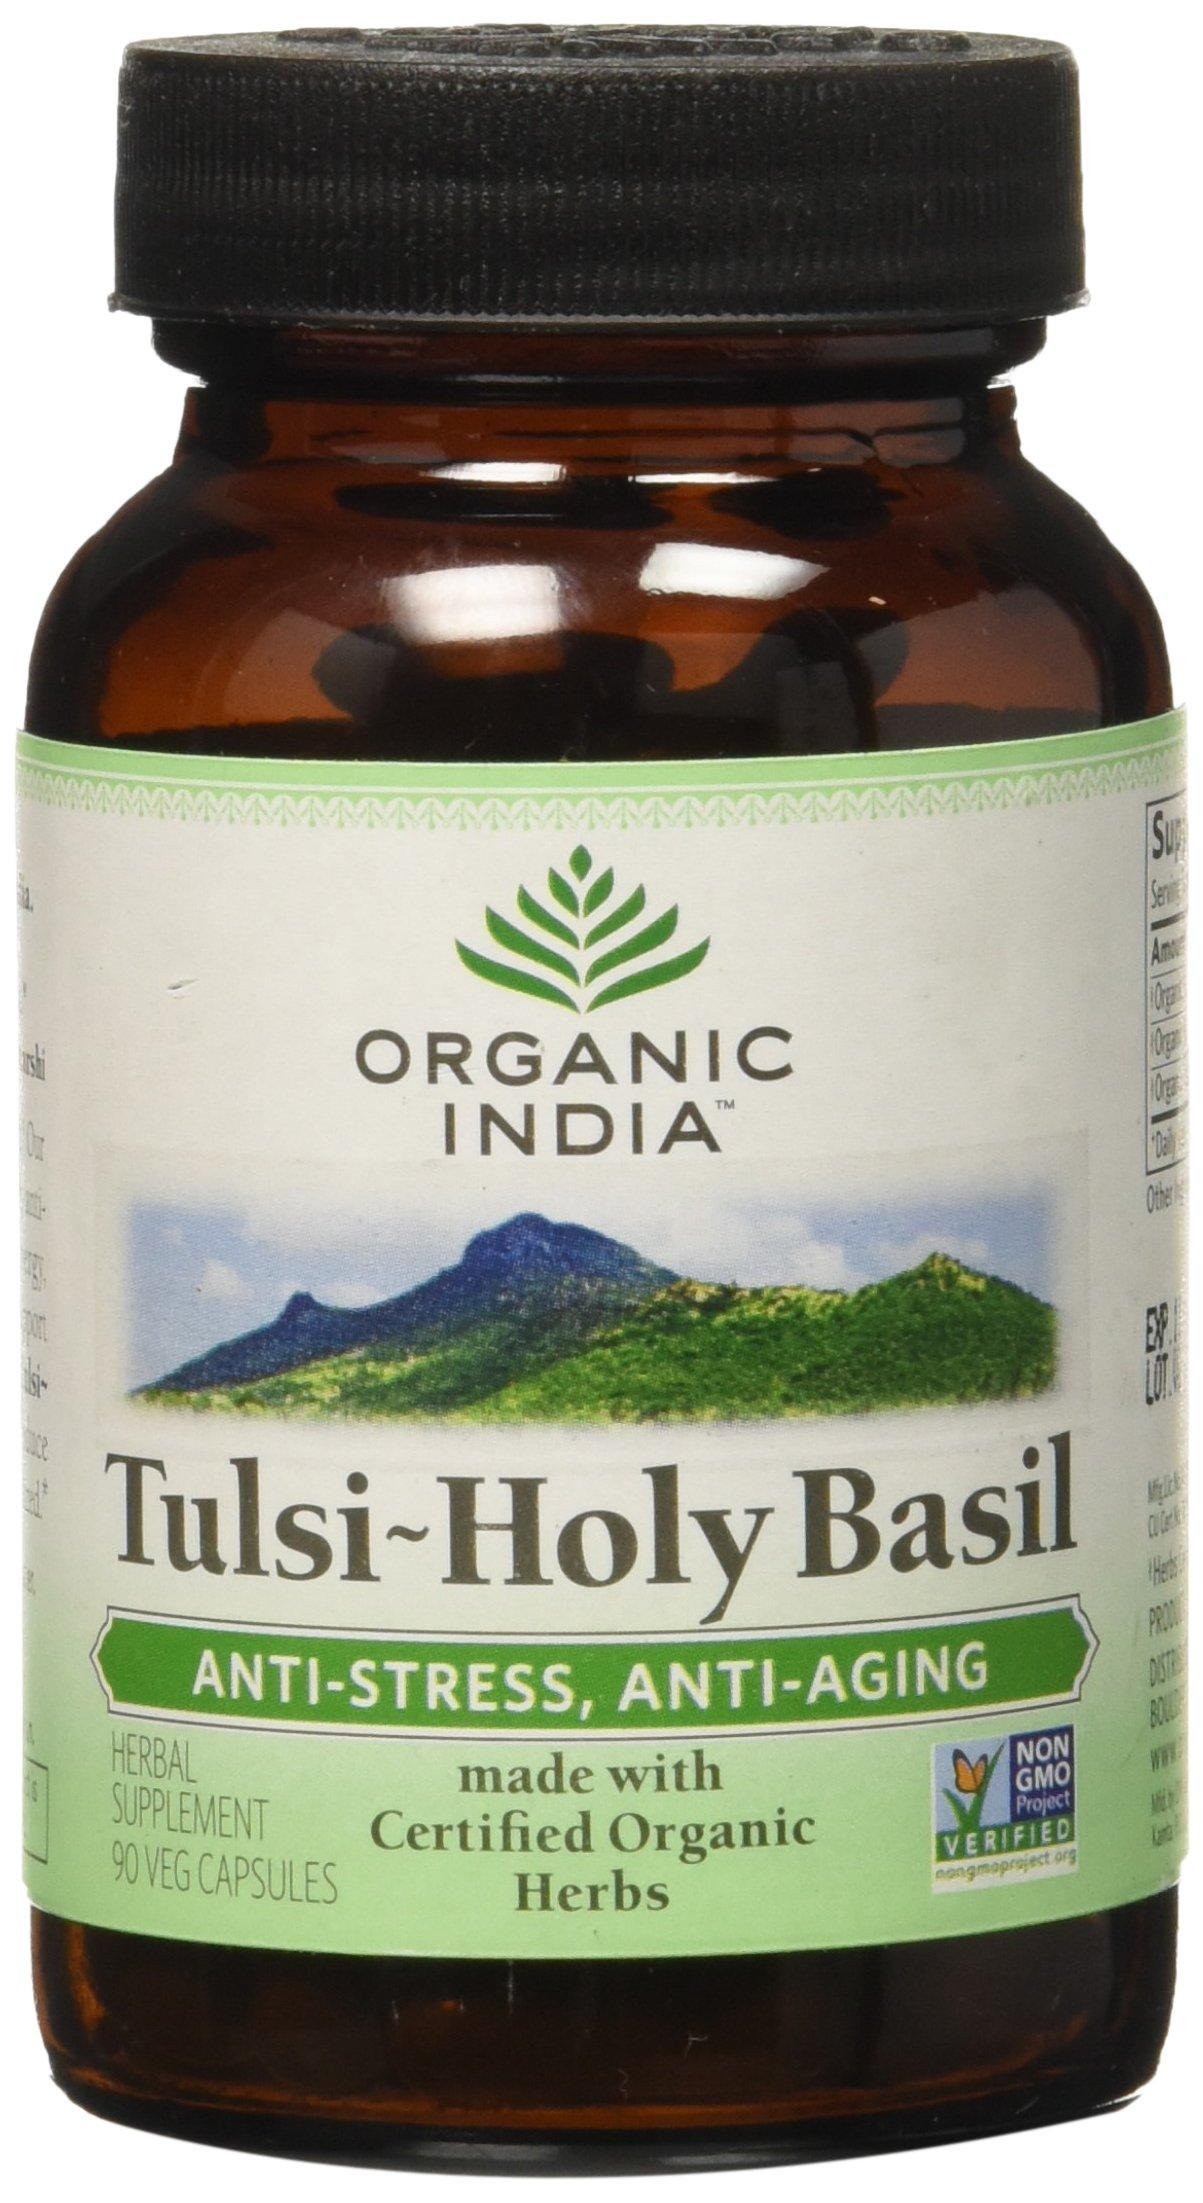 Organic India Tulsi Holy Basil, 90 Count